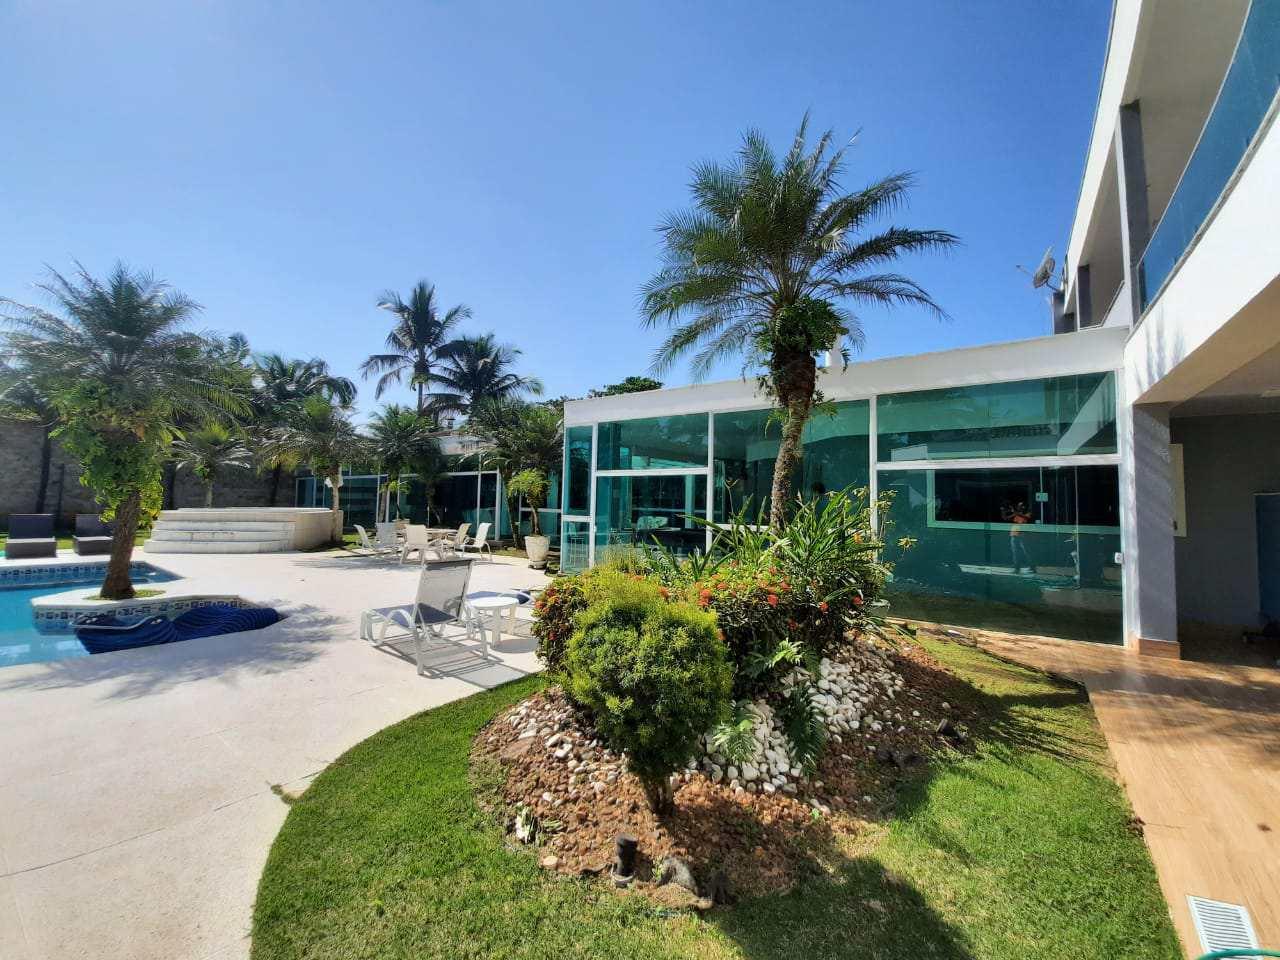 Casa de Condomínio com 6 dorms, Acapulco, Guarujá - R$ 6 mi, Cod: 2925